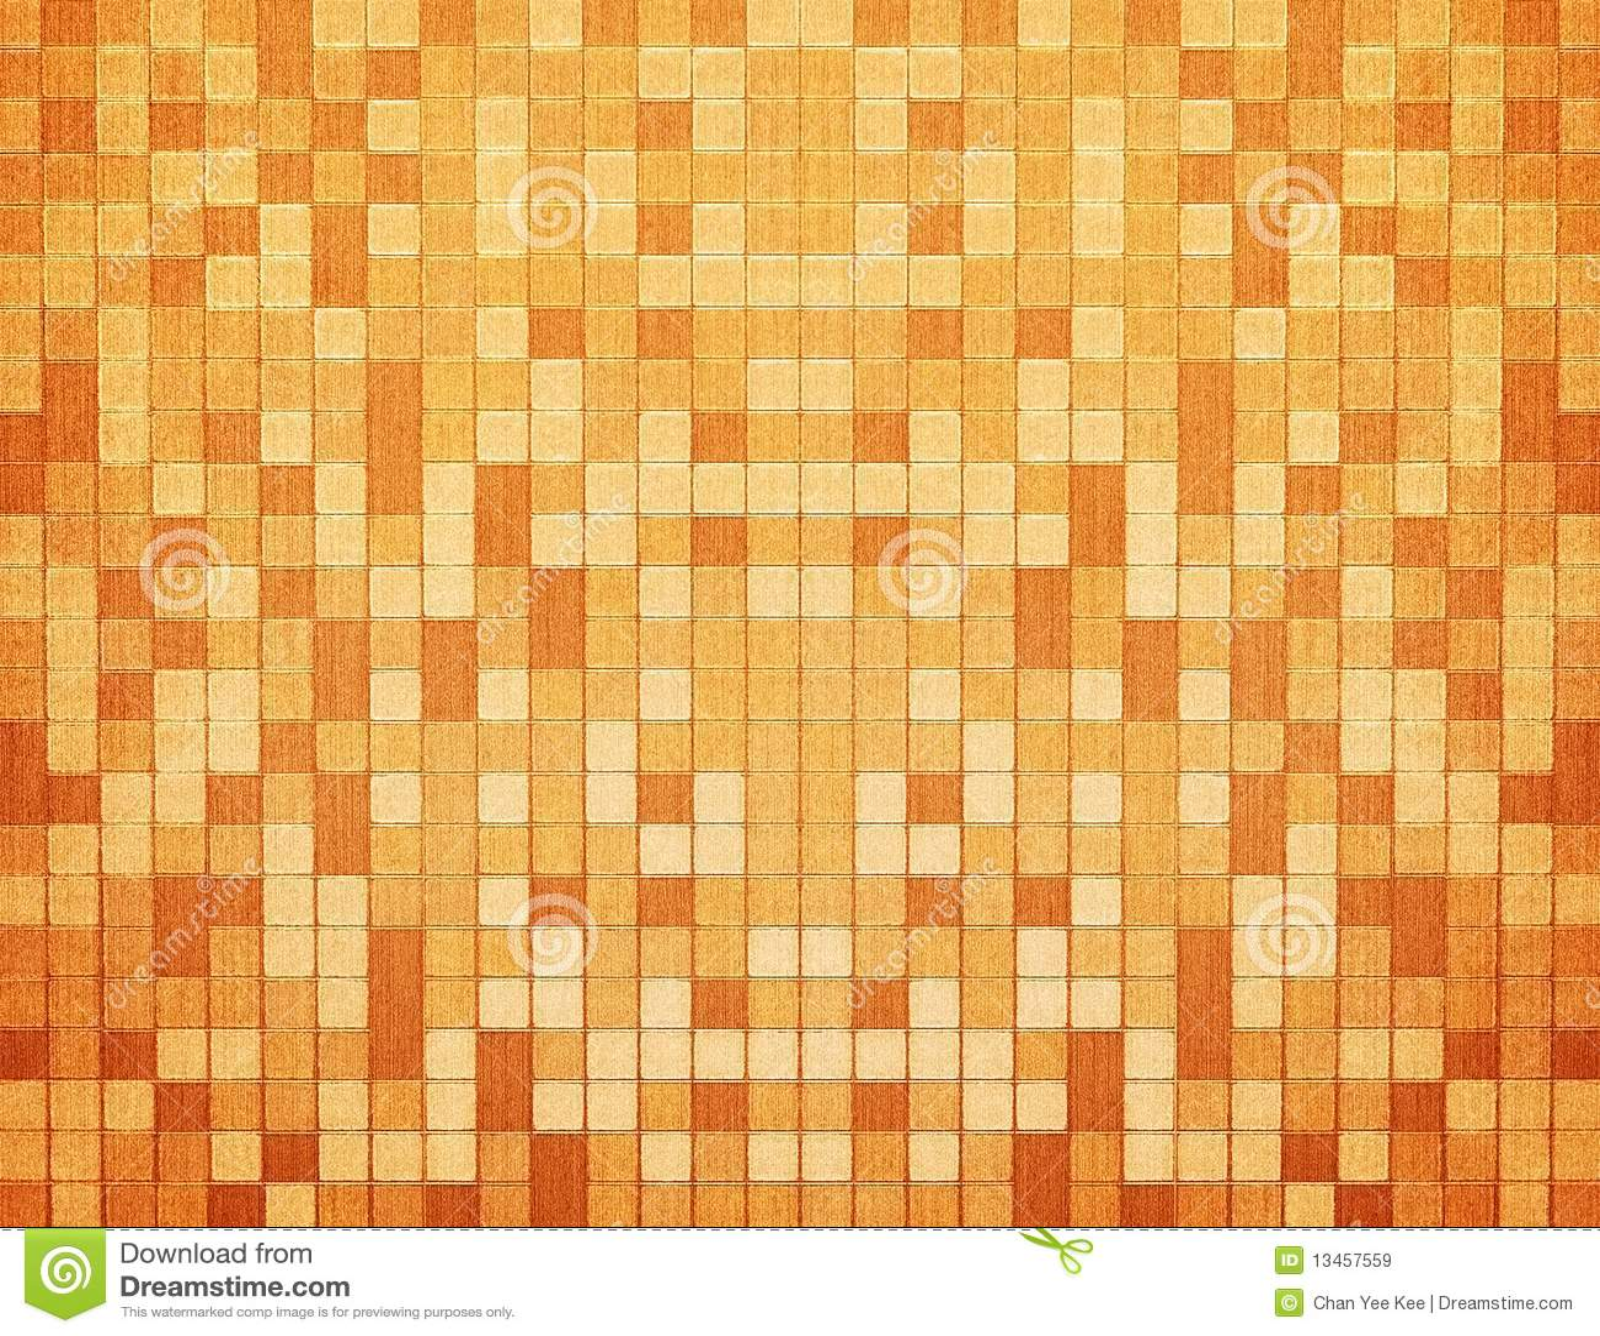 mosaic wallpaper royalty free stock images image 13457559